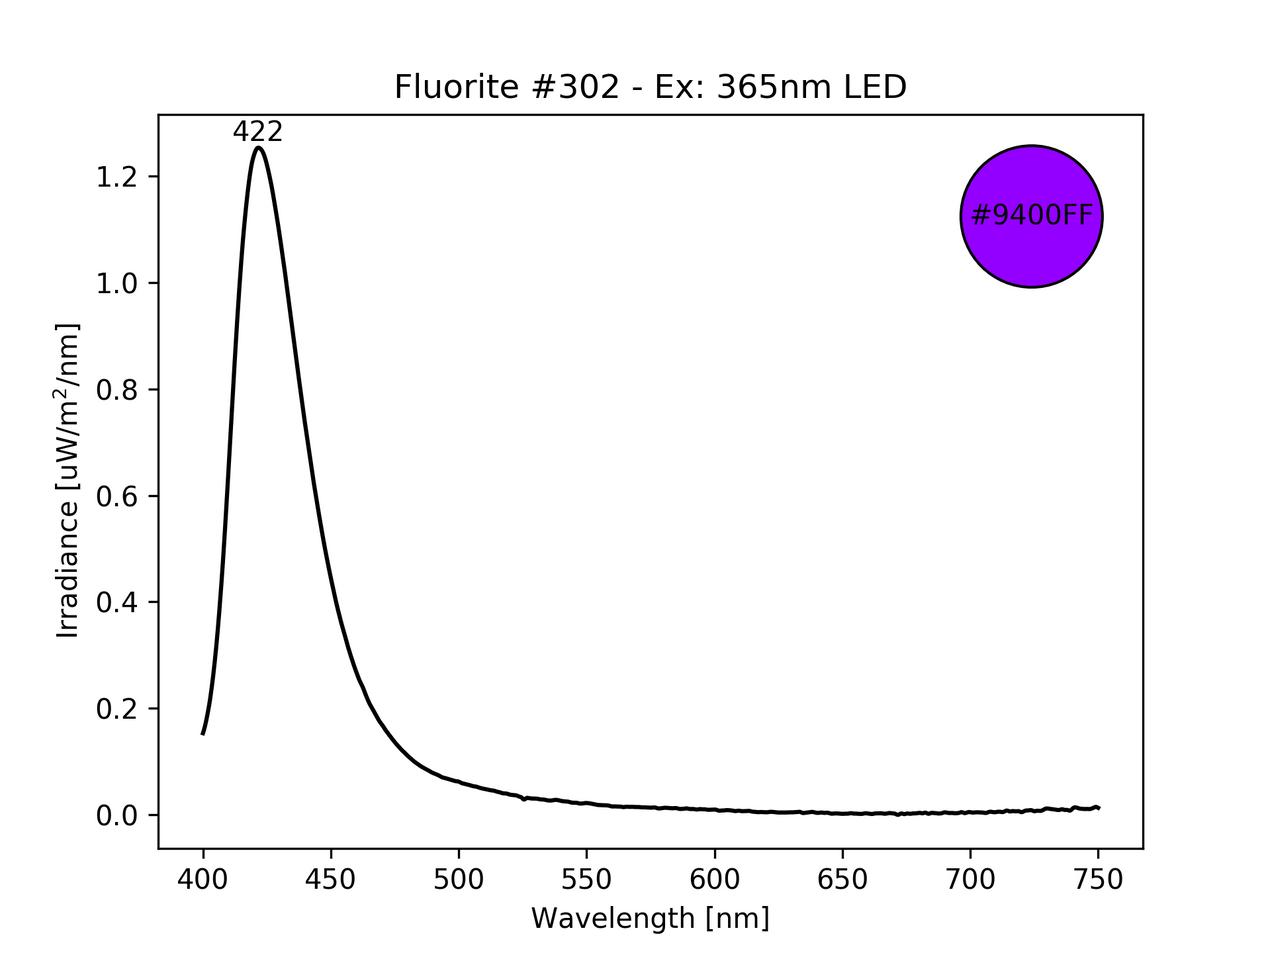 Fluorite fluorescence spectrum